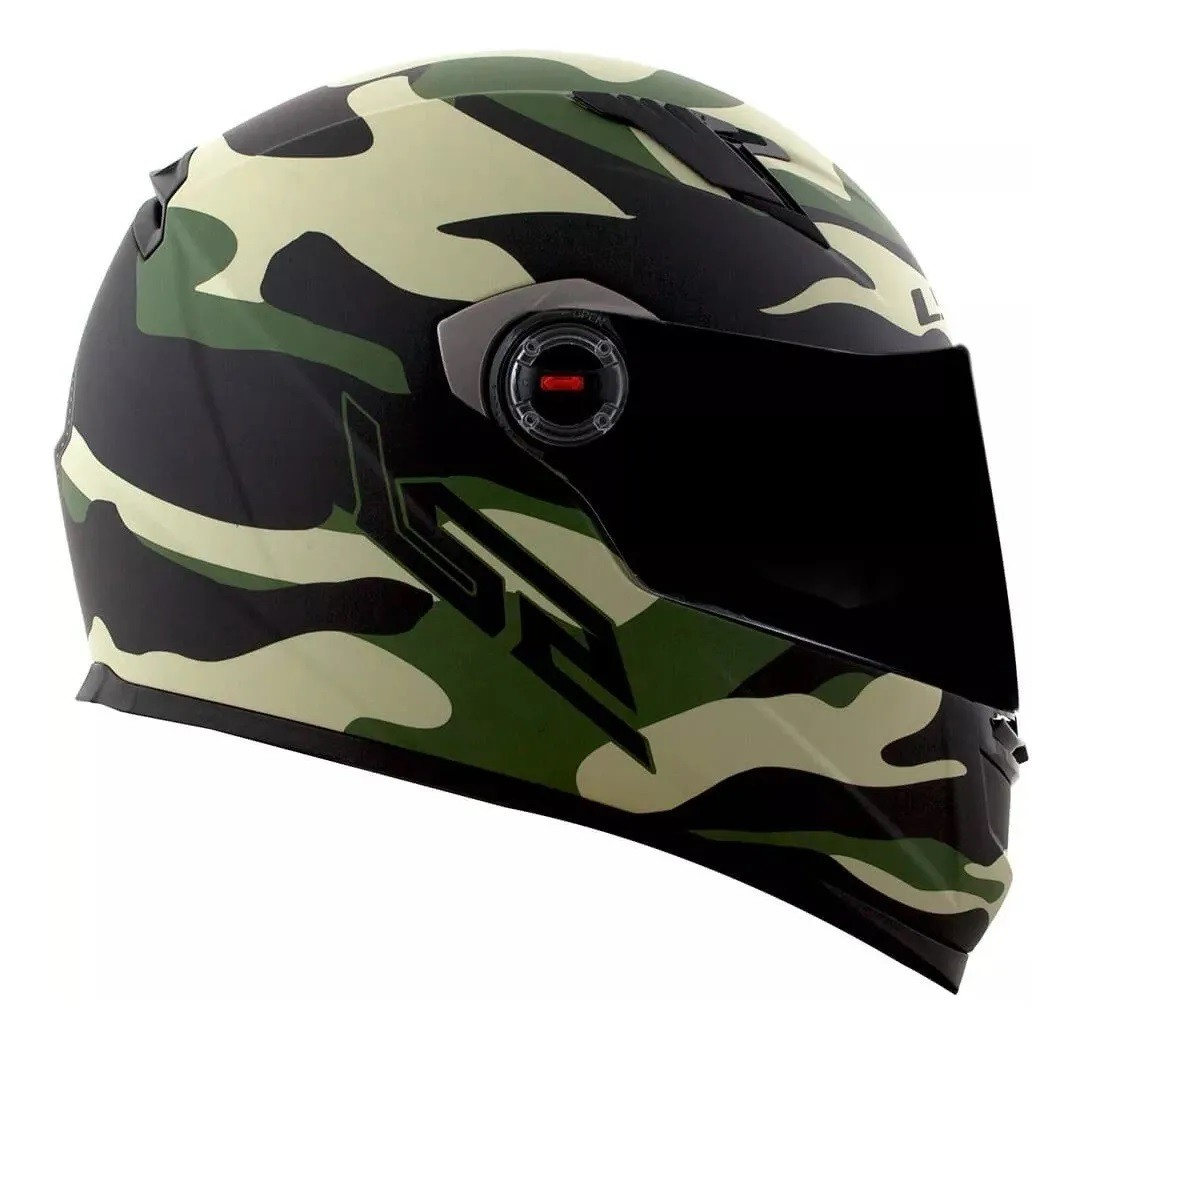 Capacete Ls2 FF358 Army Preto Fosco Verde Militar